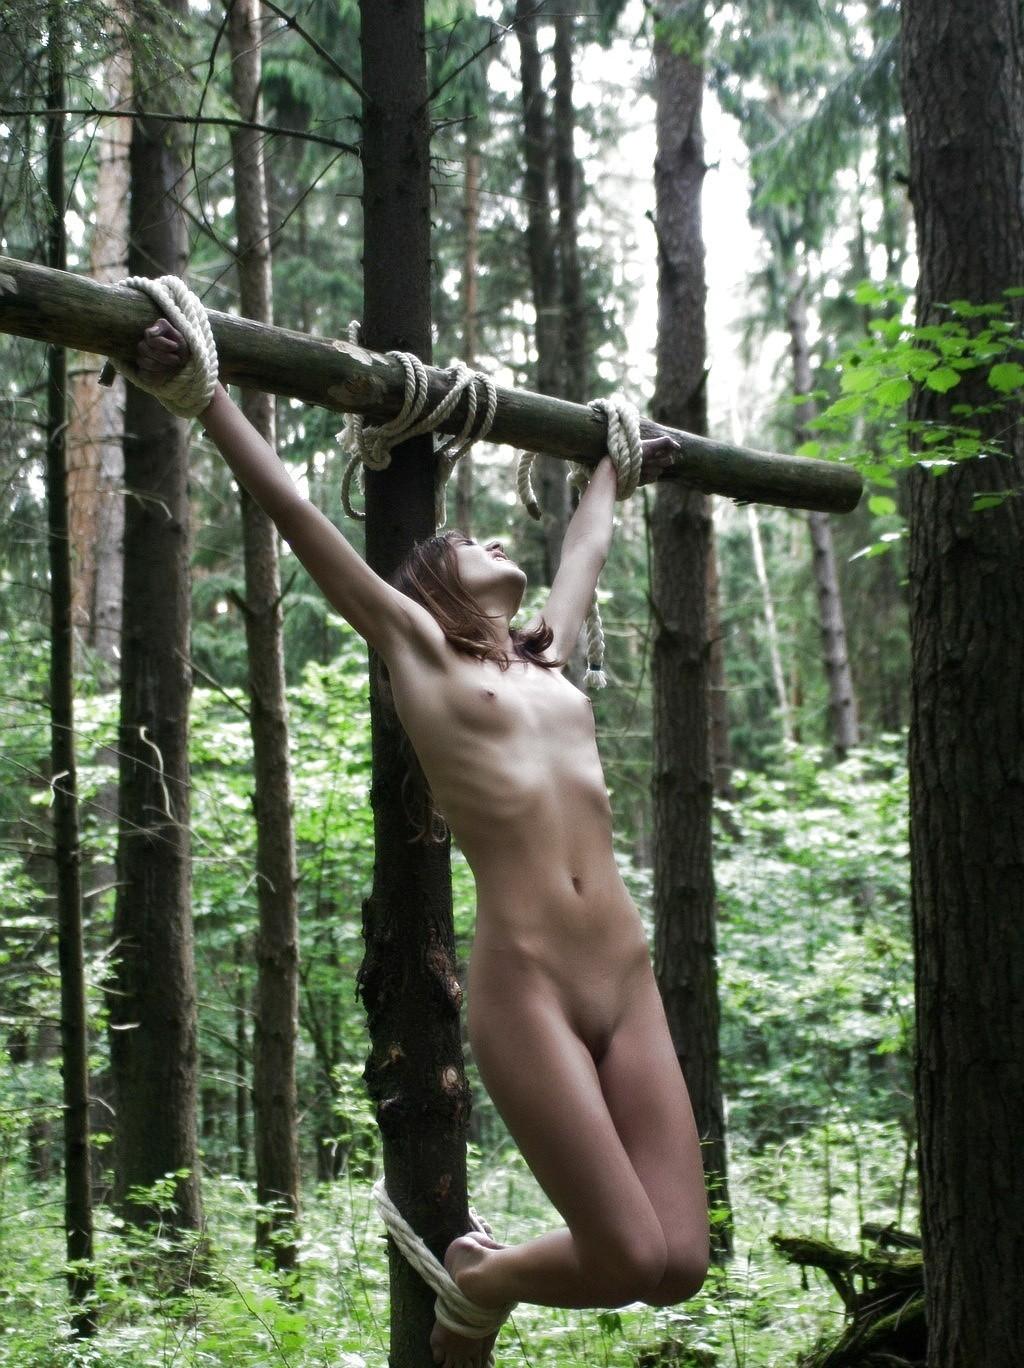 spanking bondage spanking the monkebdsmsex bdsm cel